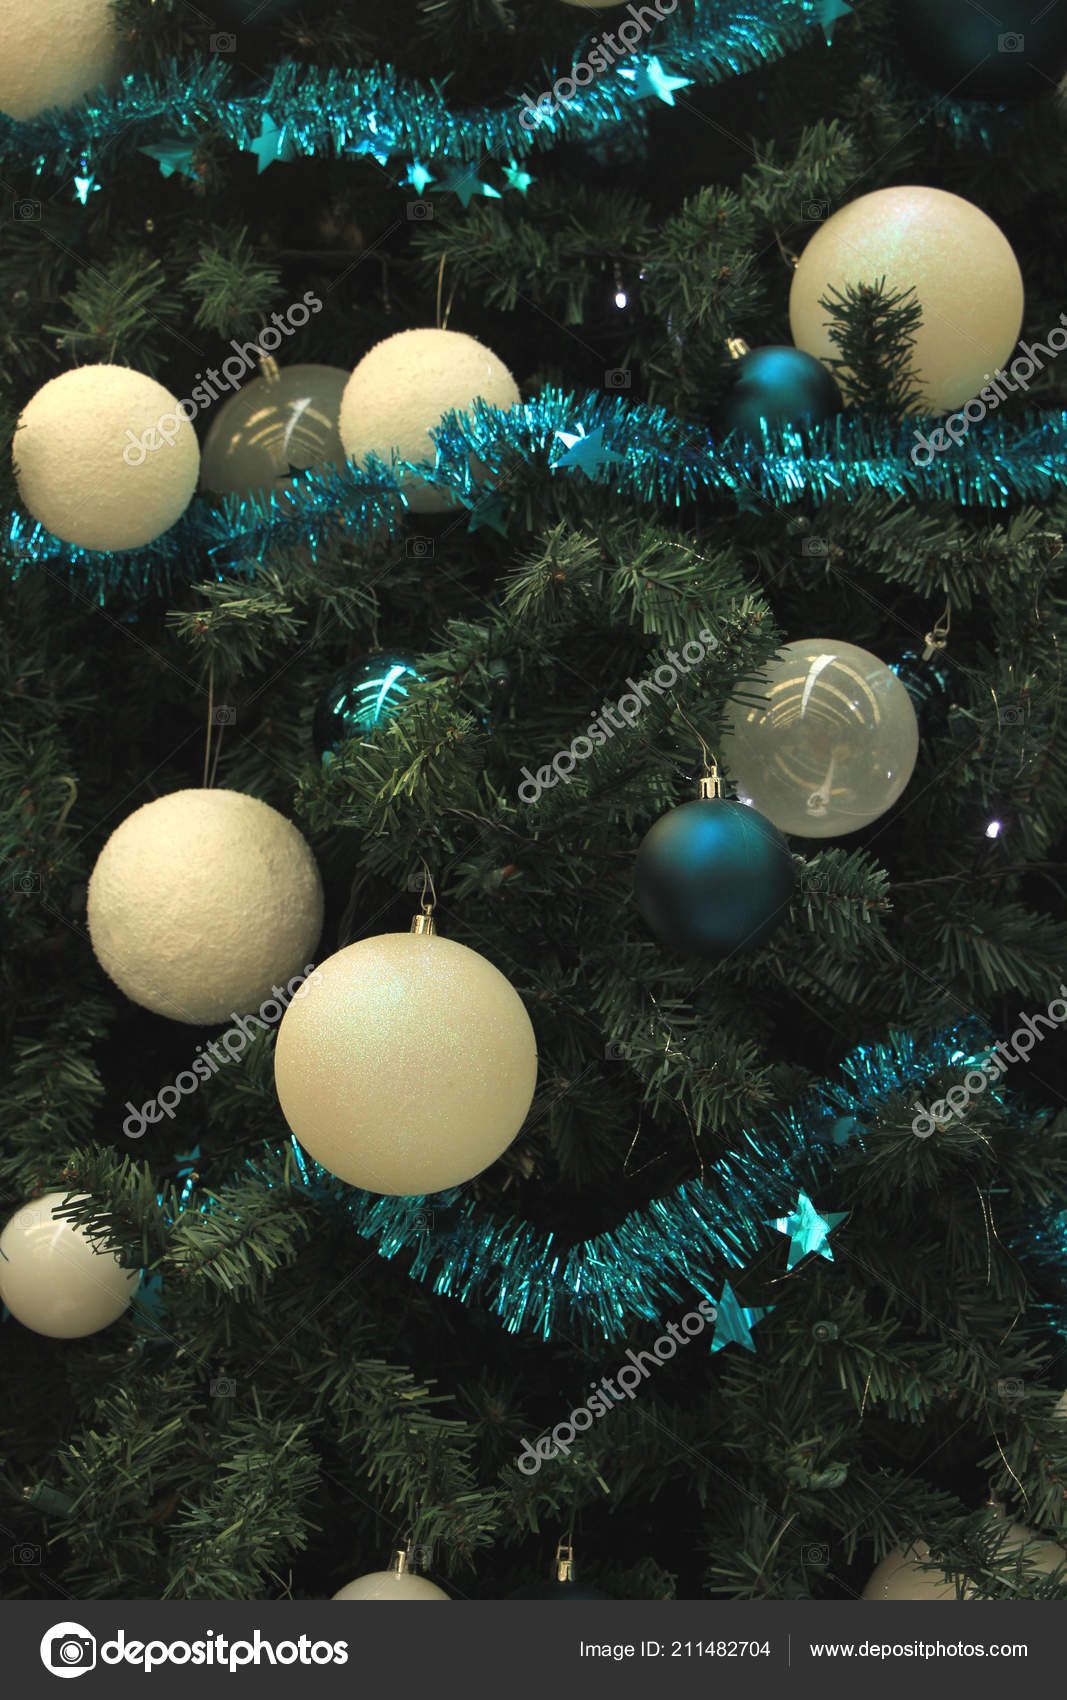 Pastel Christmas Ornaments.Christmas Ornaments Teal Pastel Blue Colors Christmas Retail